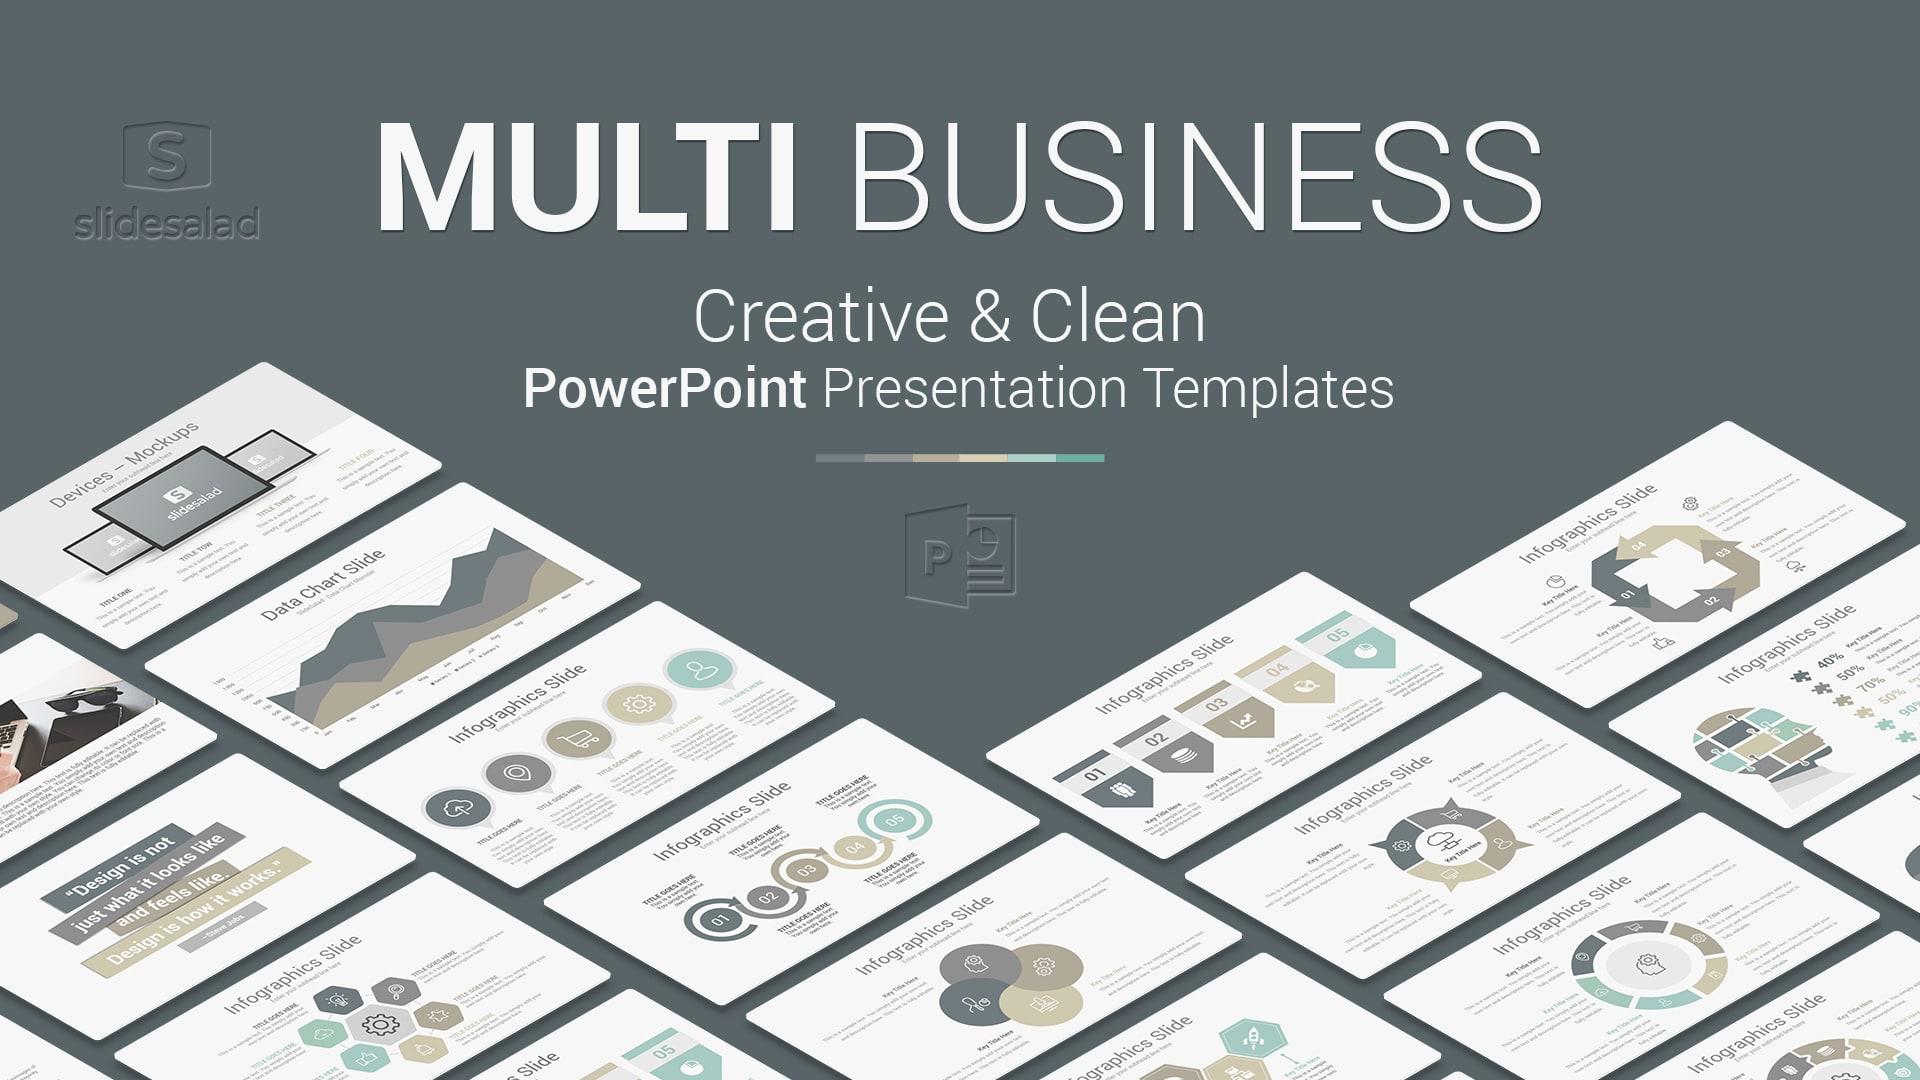 Multipurpose-Business-PowerPoint-Presentation-Templates